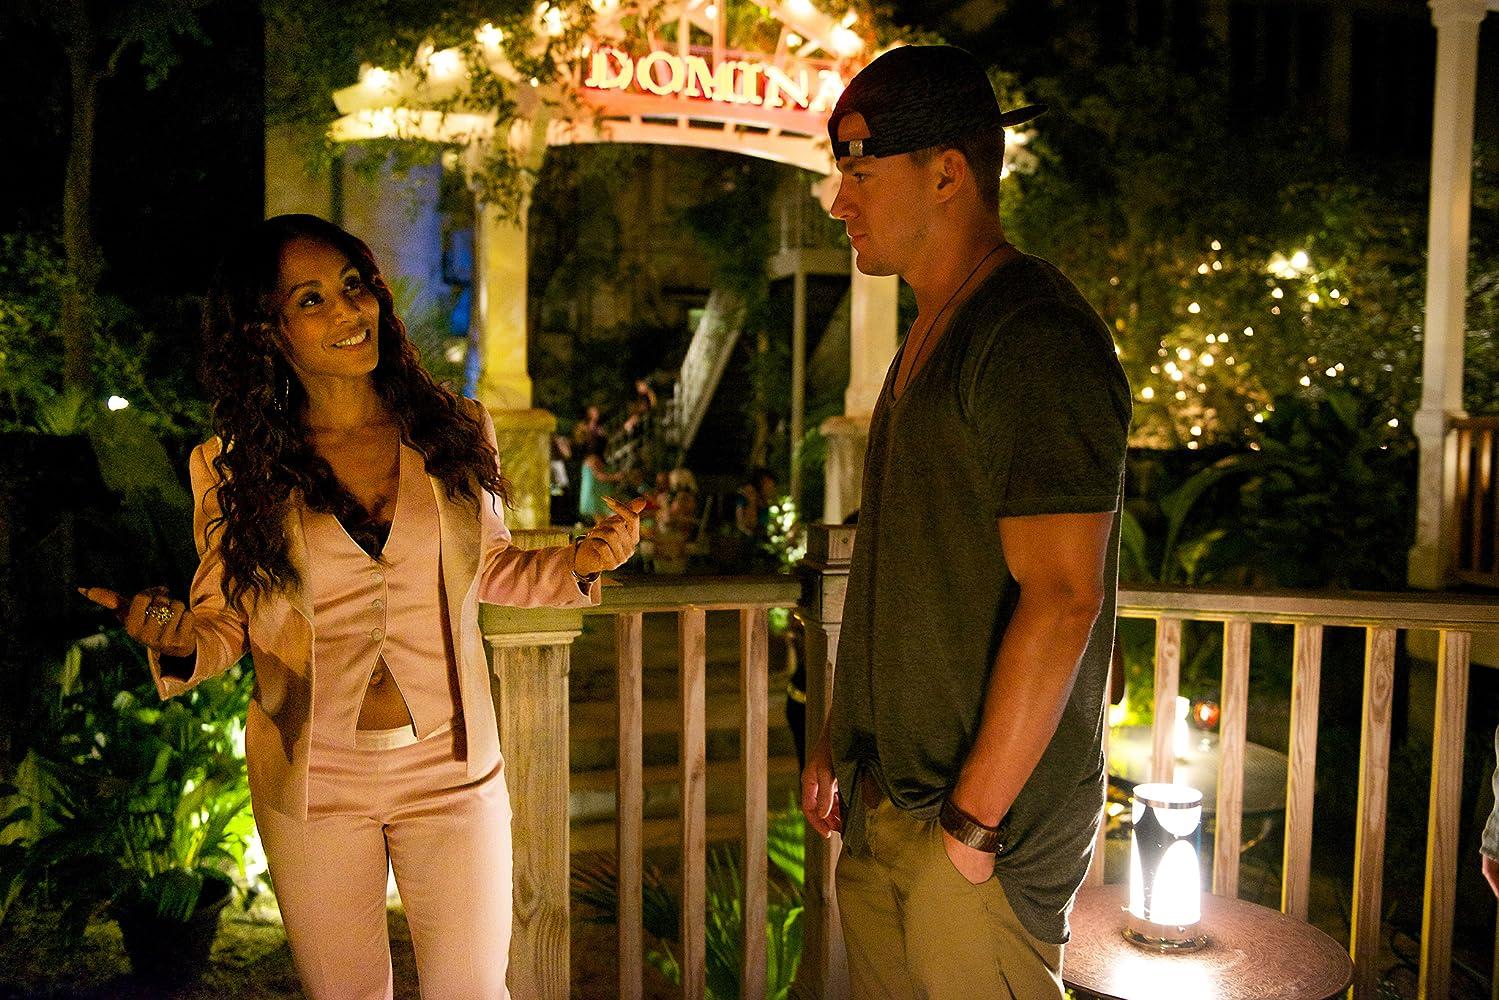 Jada Pinkett Smith and Channing Tatum in Magic Mike XXL (2015)